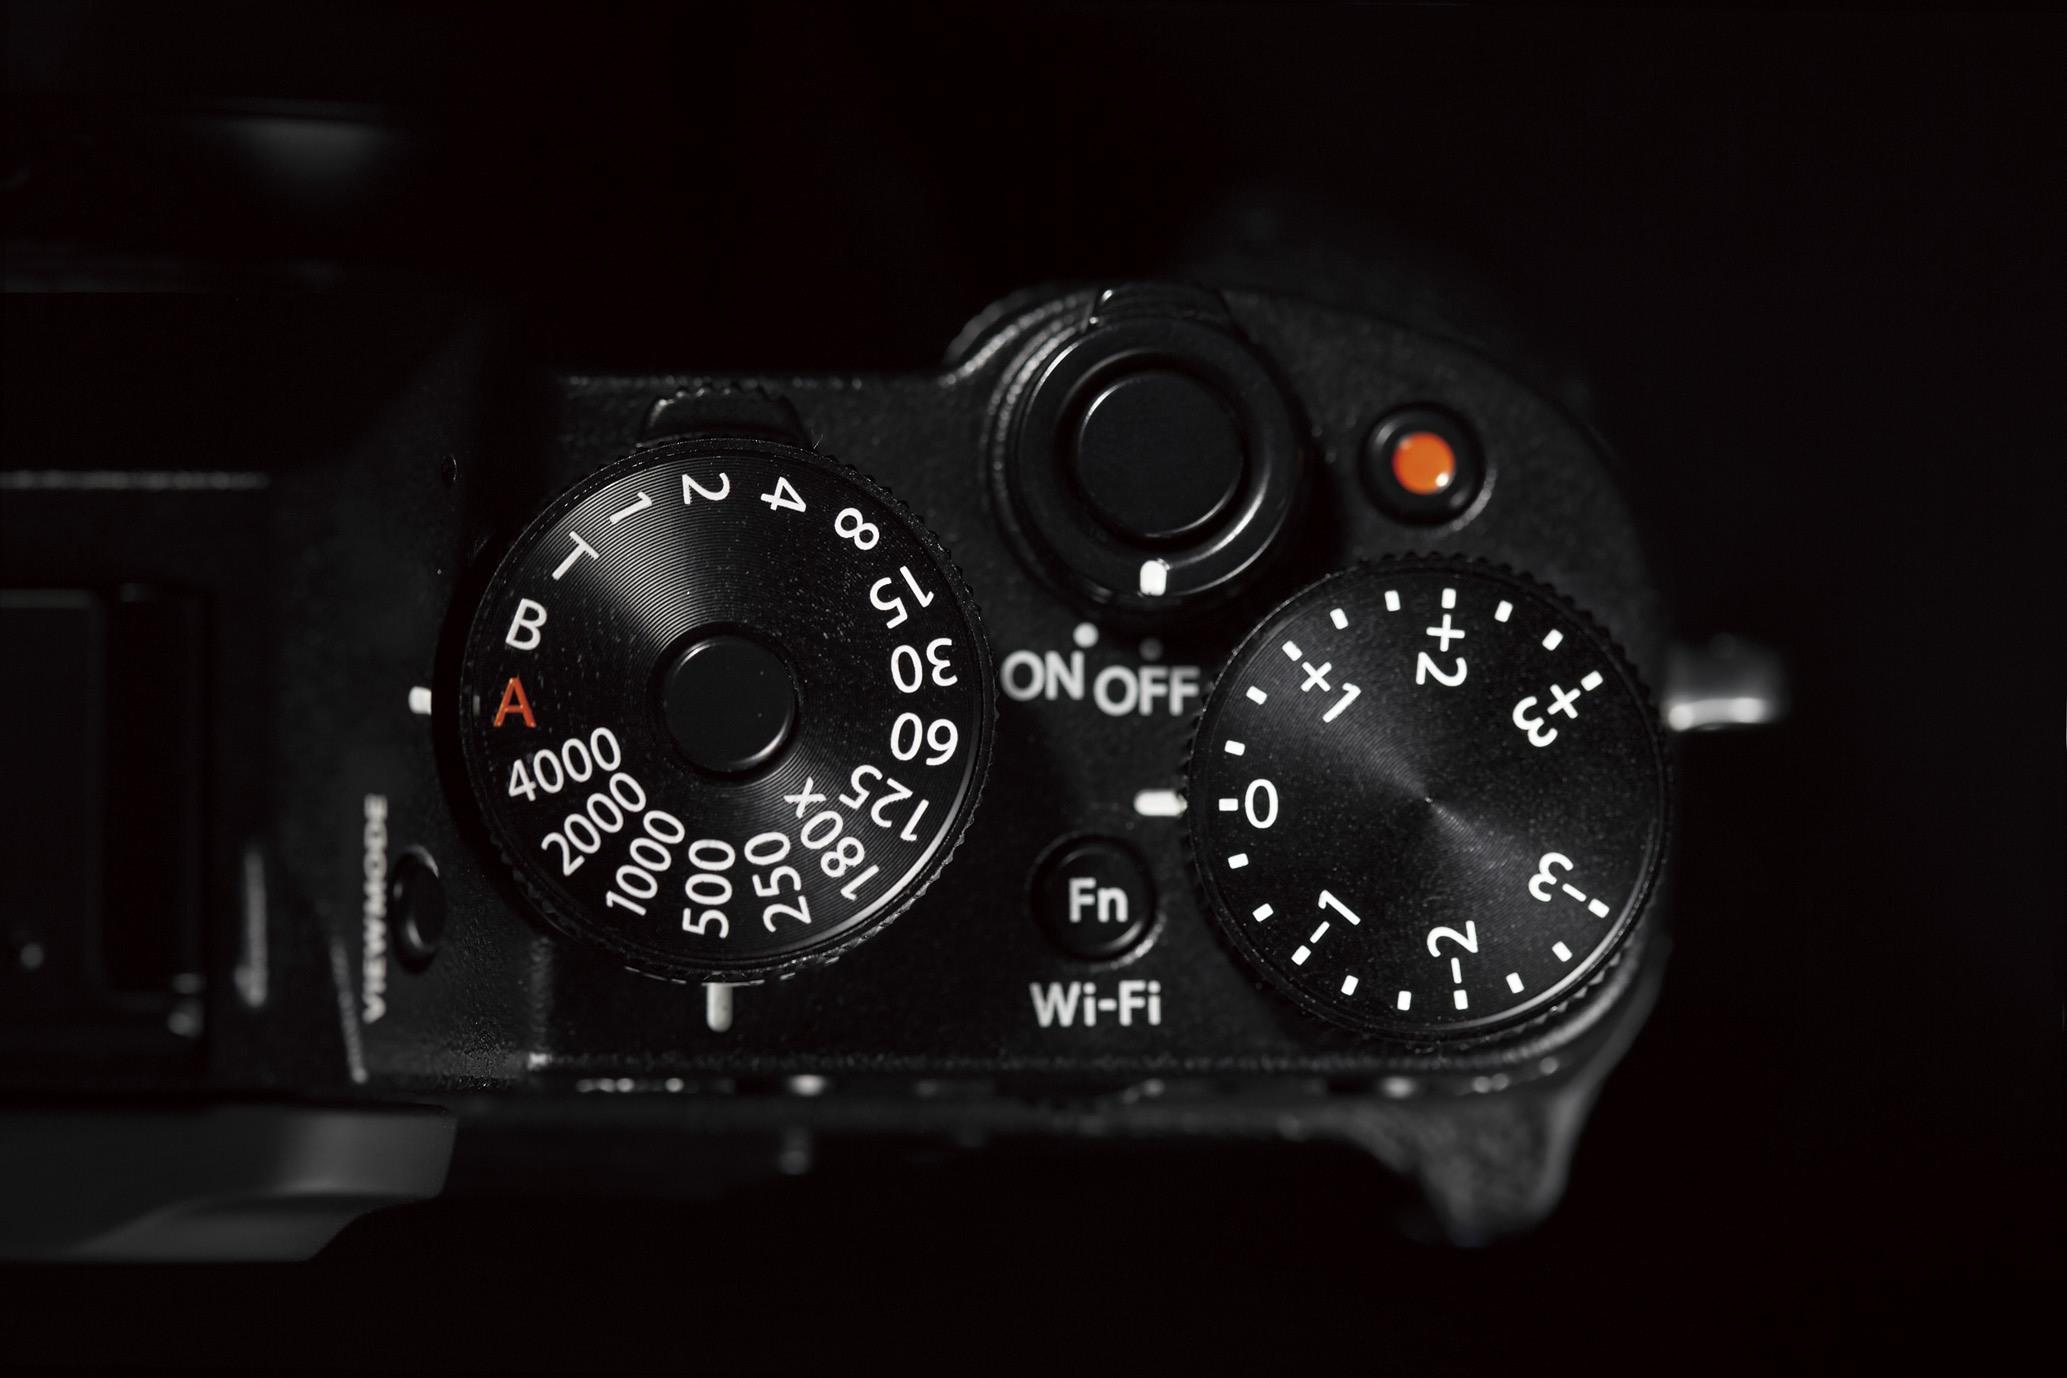 XT1_Dial-Top_BlackBK_061.JPG